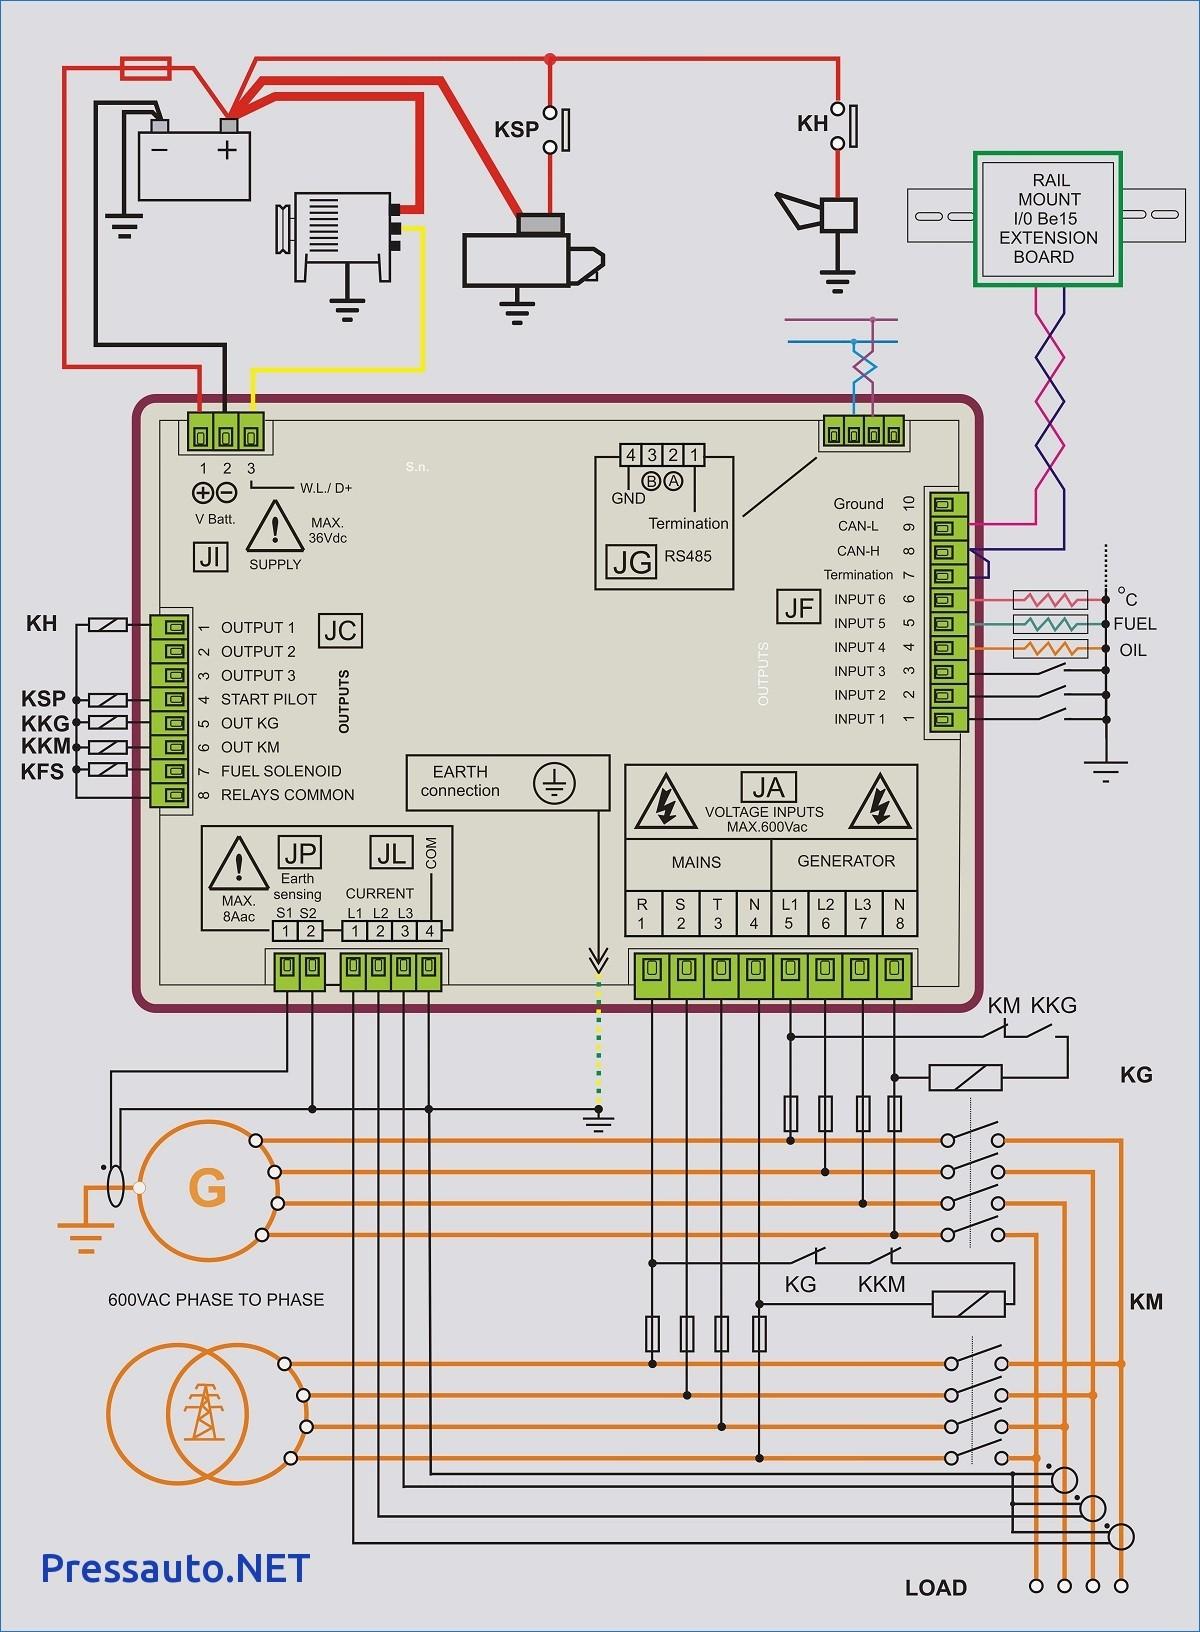 Wiring Diagram Standby Generator New Portable Generator Transfer Switch Wiring Diagram for Manual Generac